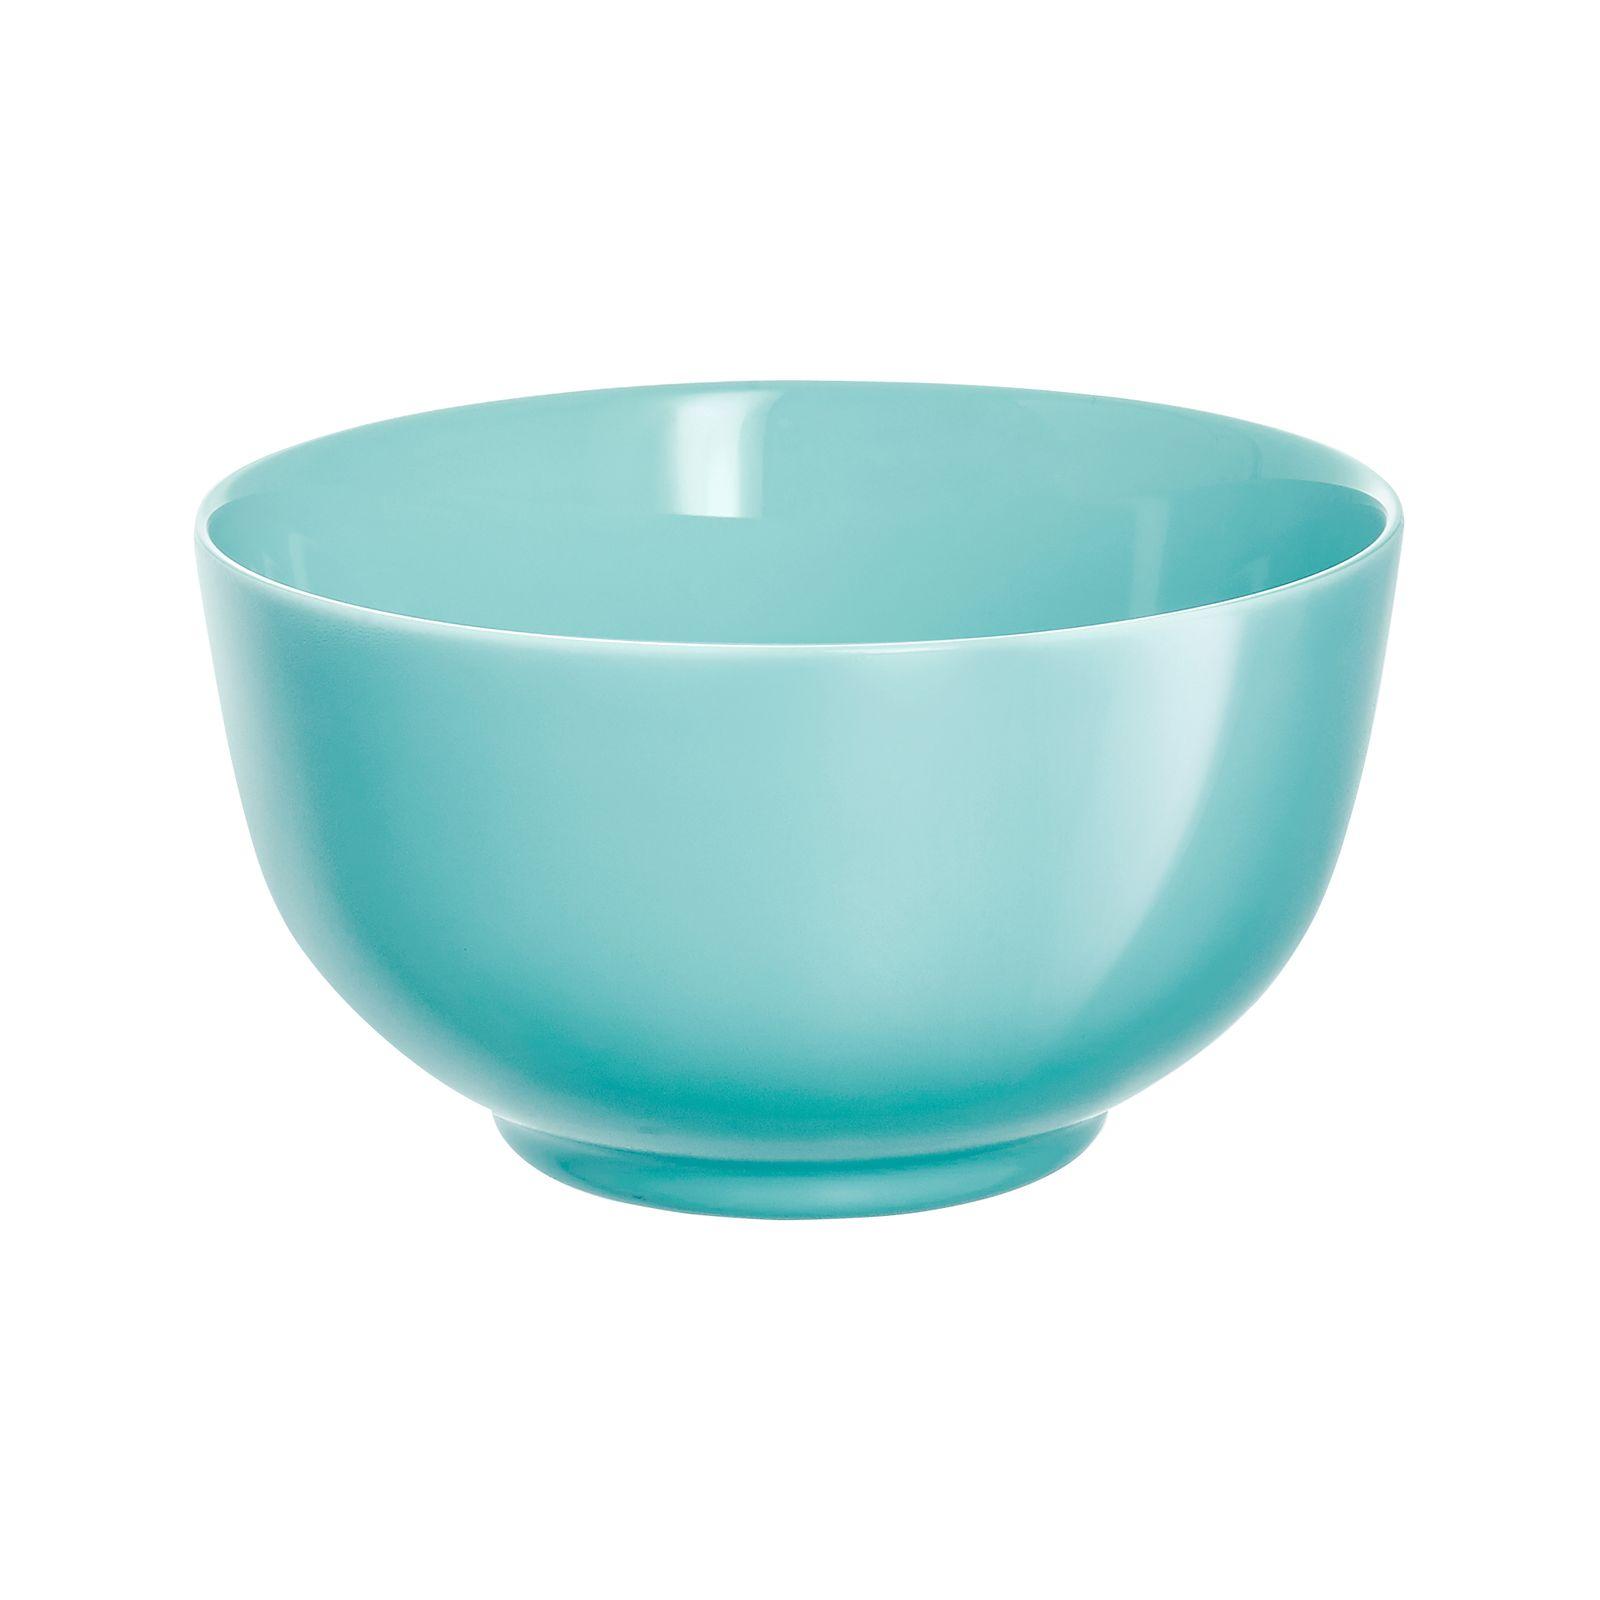 Miska do zupy Diwali Light Turquoise 14,5 cm LUMINARC